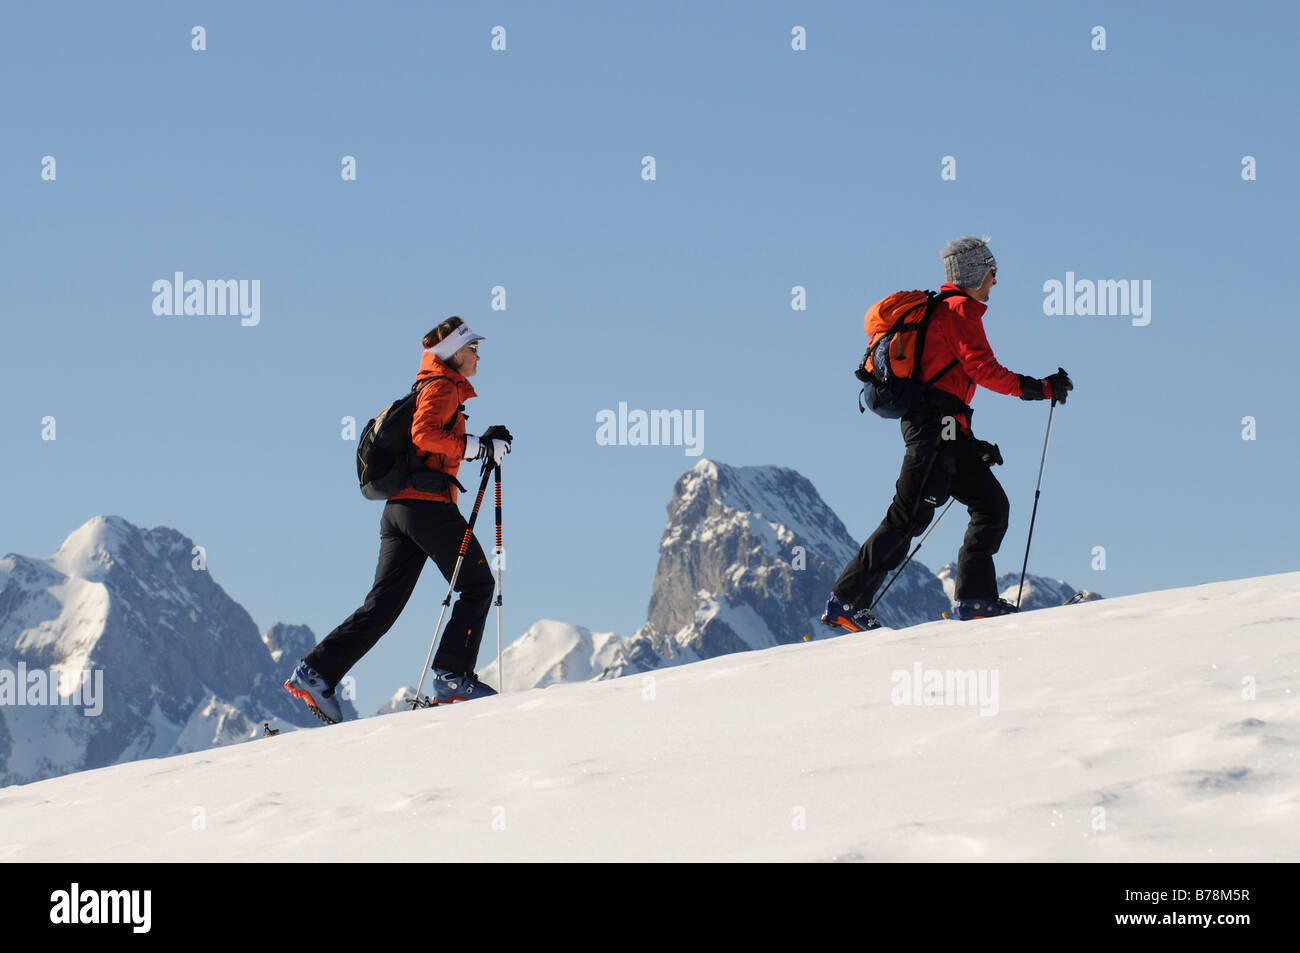 Sci alpinisti, Zweisimmen, Rueblihorn, Gummfluh, Saanenland, Gstaad, West Alpi Bernesi, paese alto, Svizzera, Eur Immagini Stock